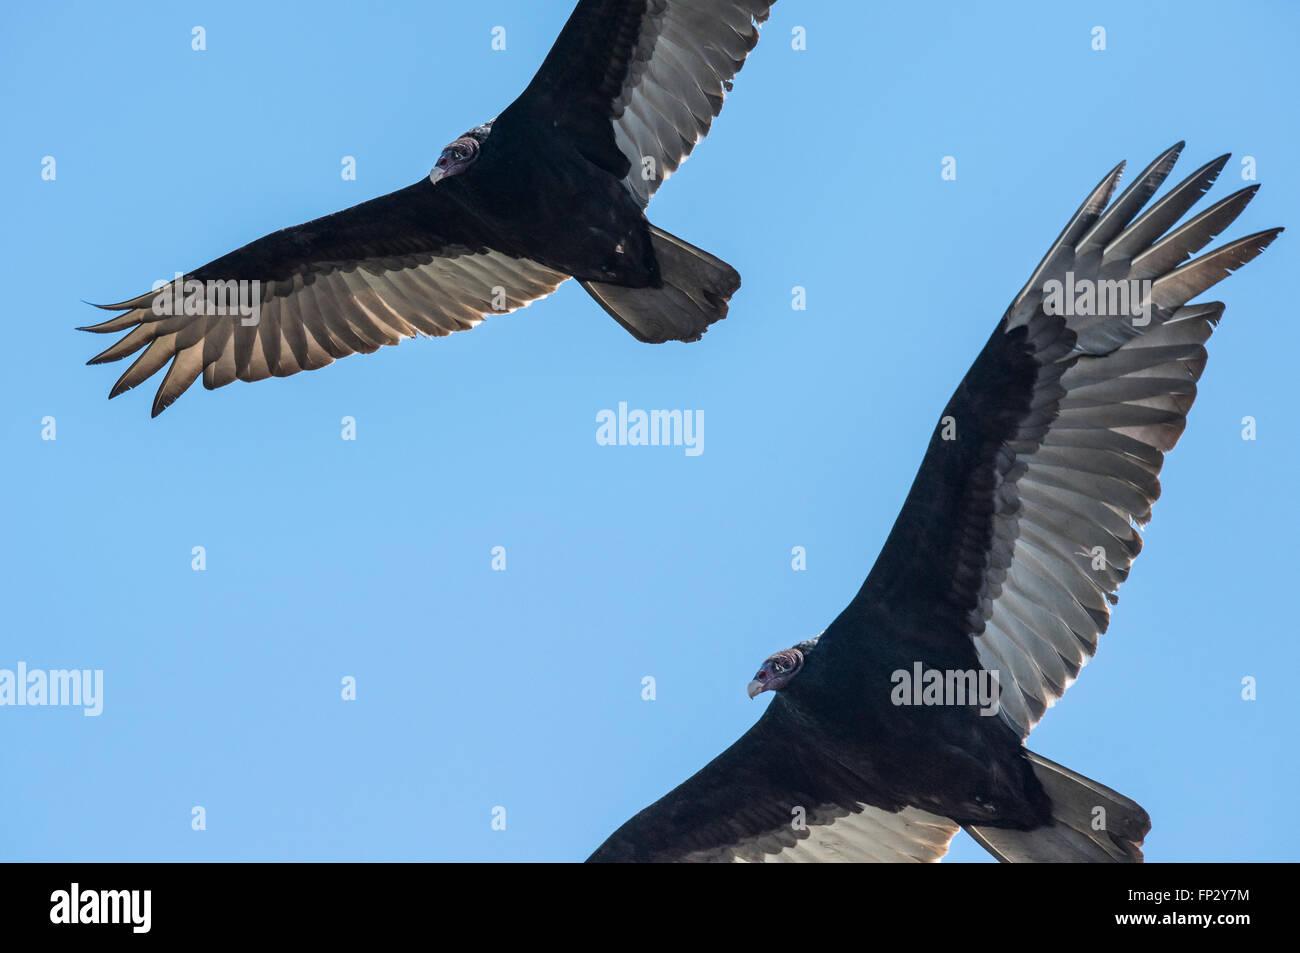 Black vultures soaring overhead - Stock Image